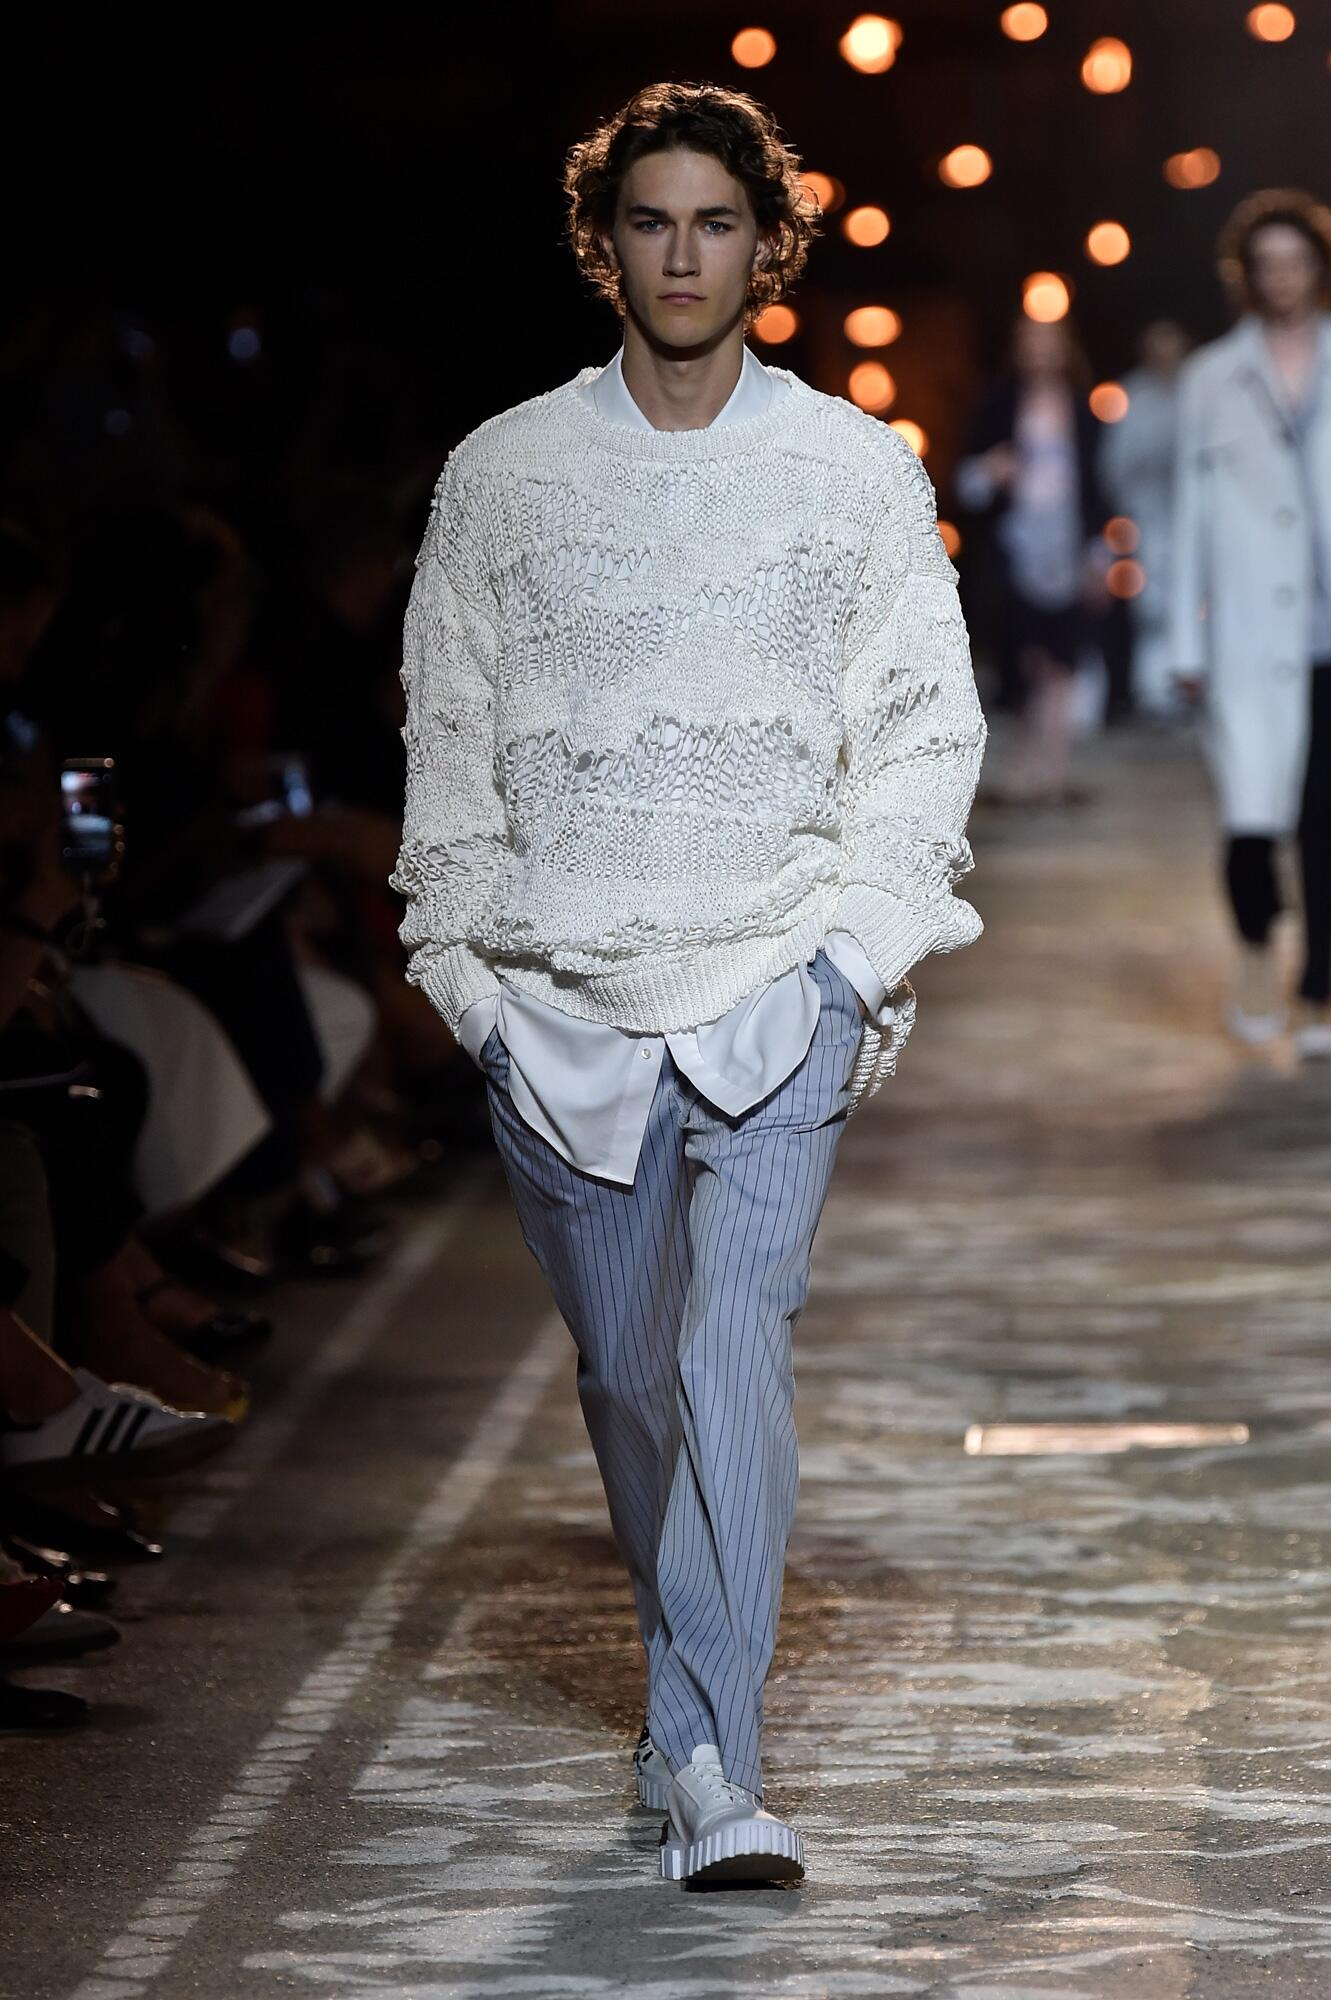 Hugo 2018 Menswear Trends